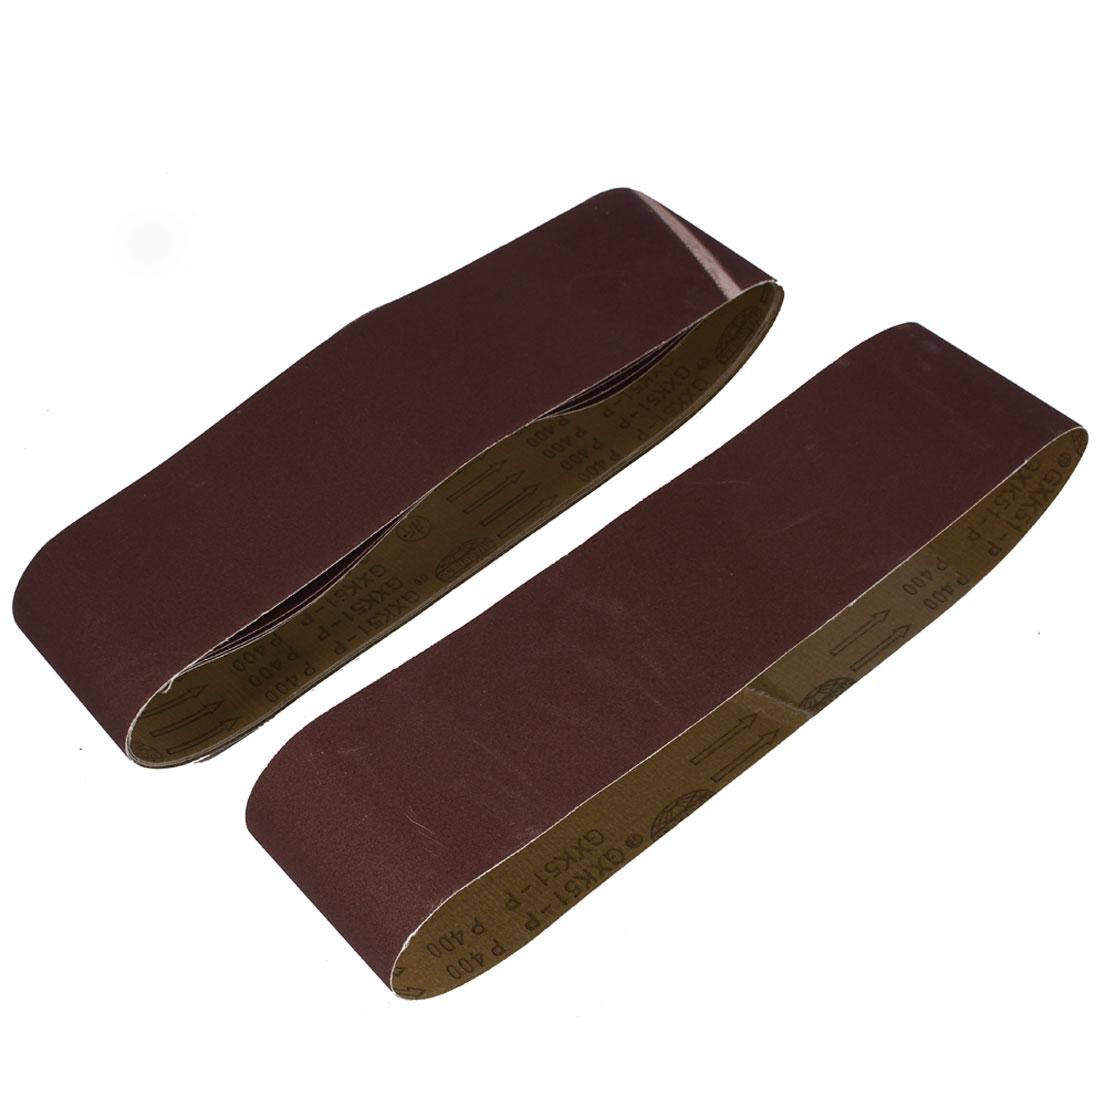 Woodworking 915mmx100mm 400 Grit Abrasive Sanding Belt Sandpaper 5pcs